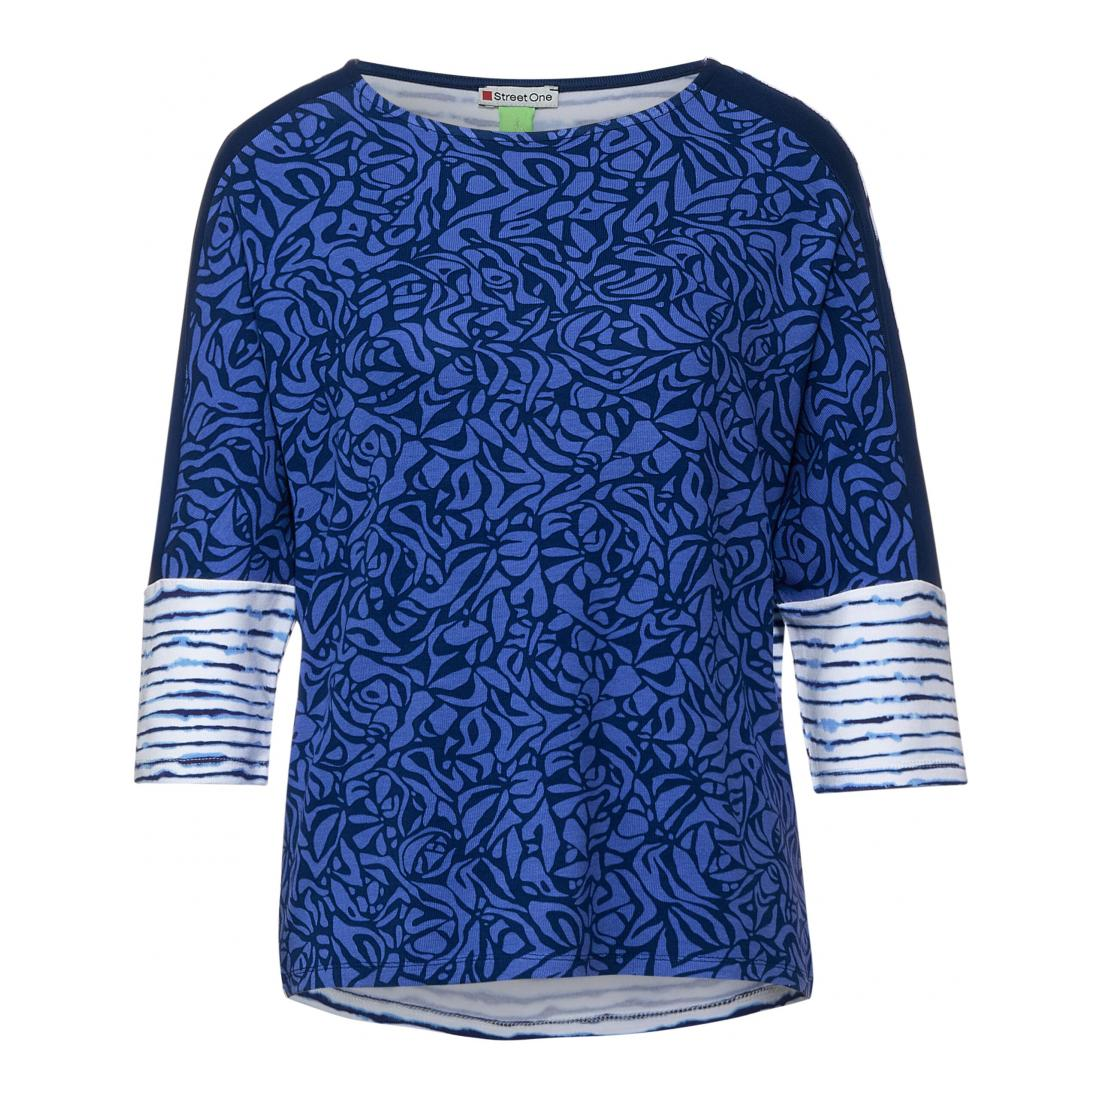 Street One Longsleeves Damen print mix shirt w.uni sho